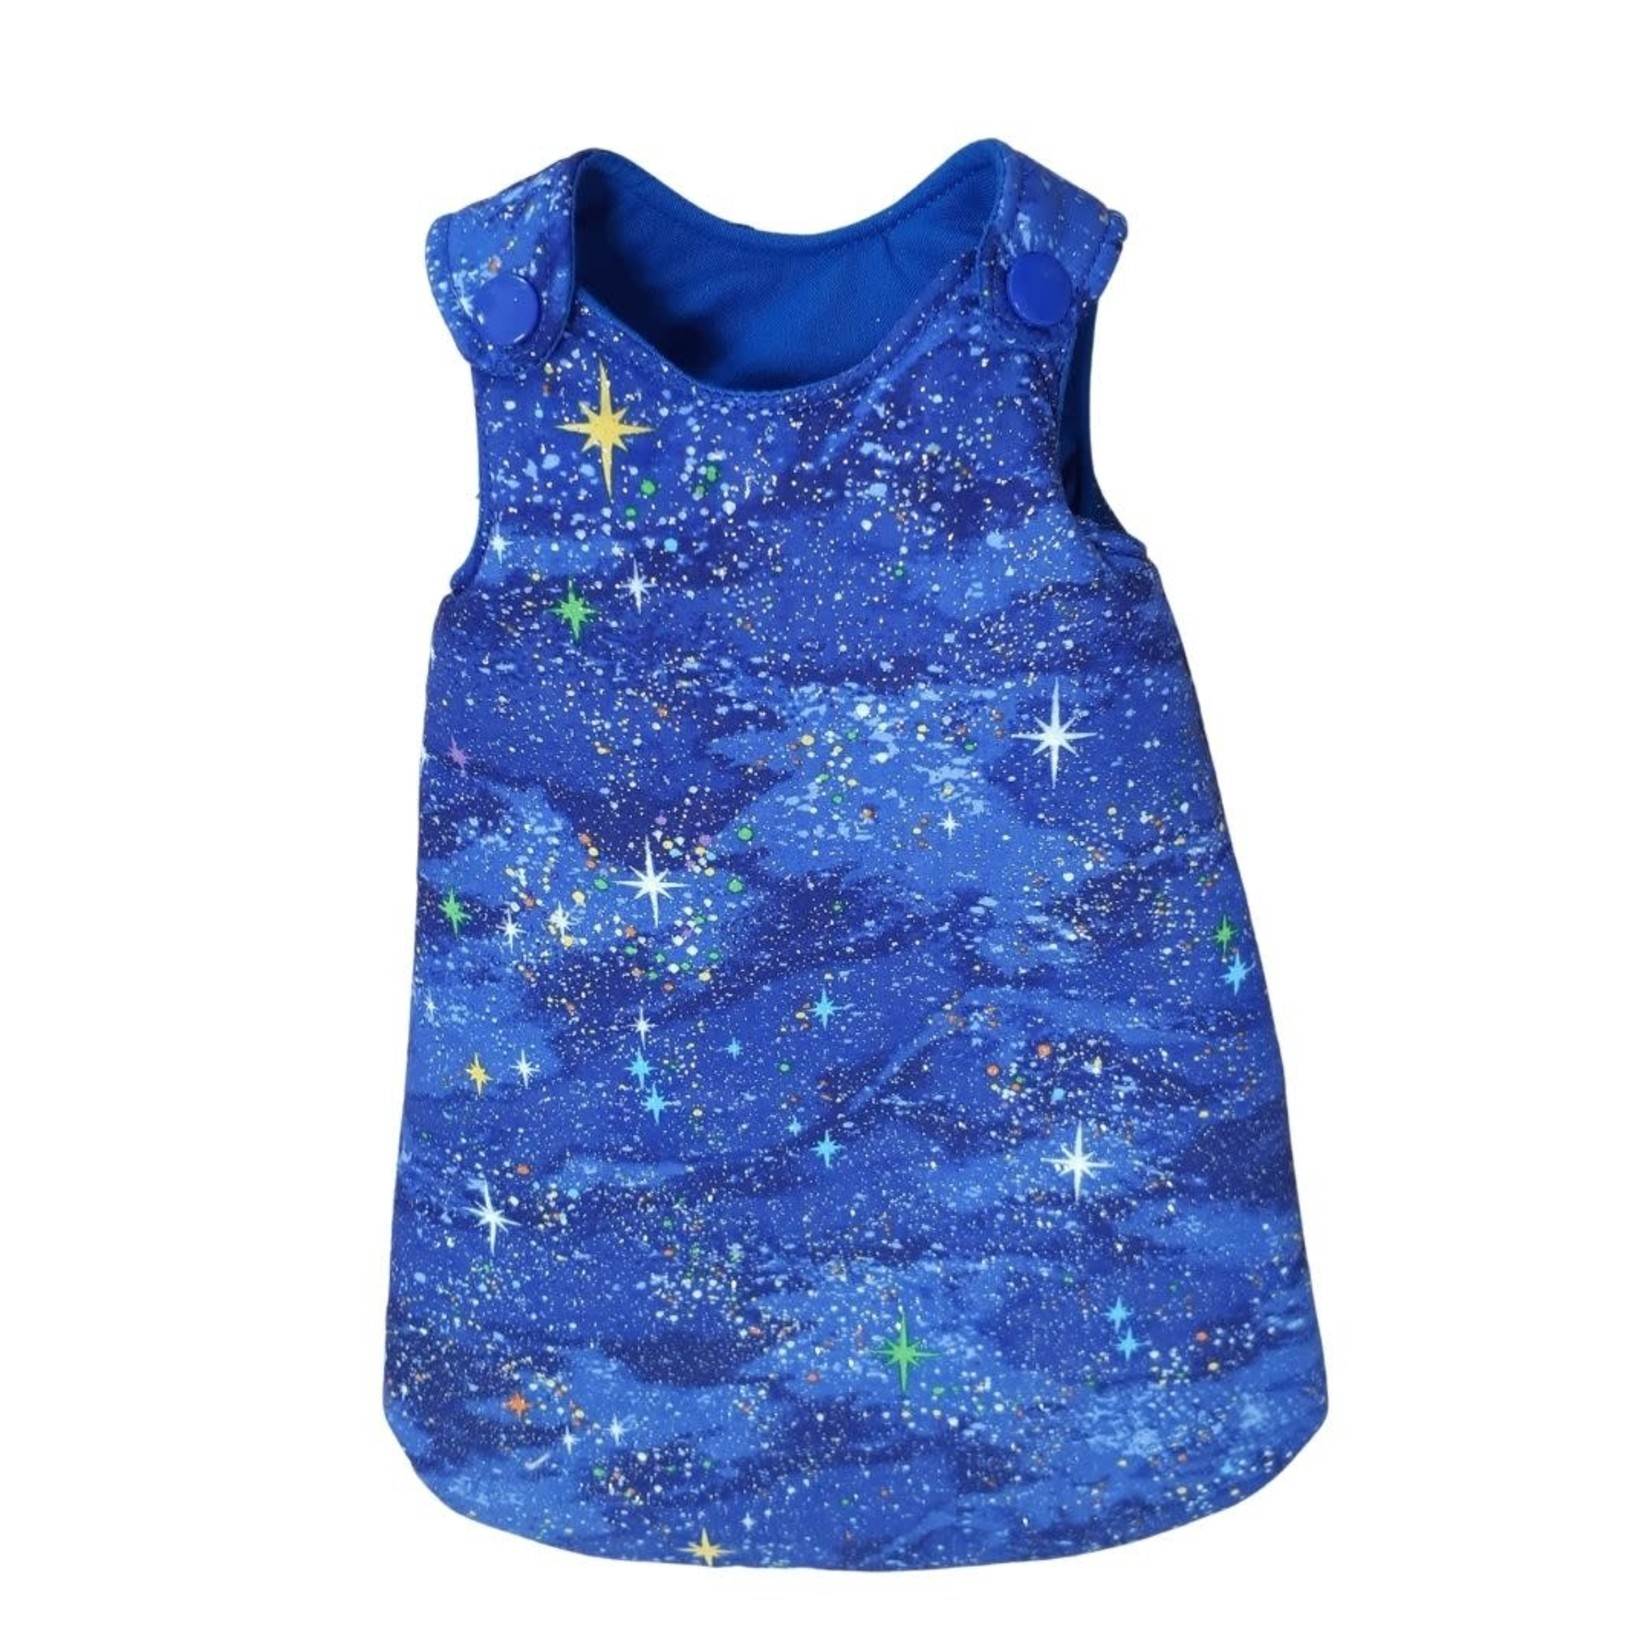 Wacky Wardrobe Wacky Wardrobe 38cm Doll Sleeping Bag Blue Sparkle